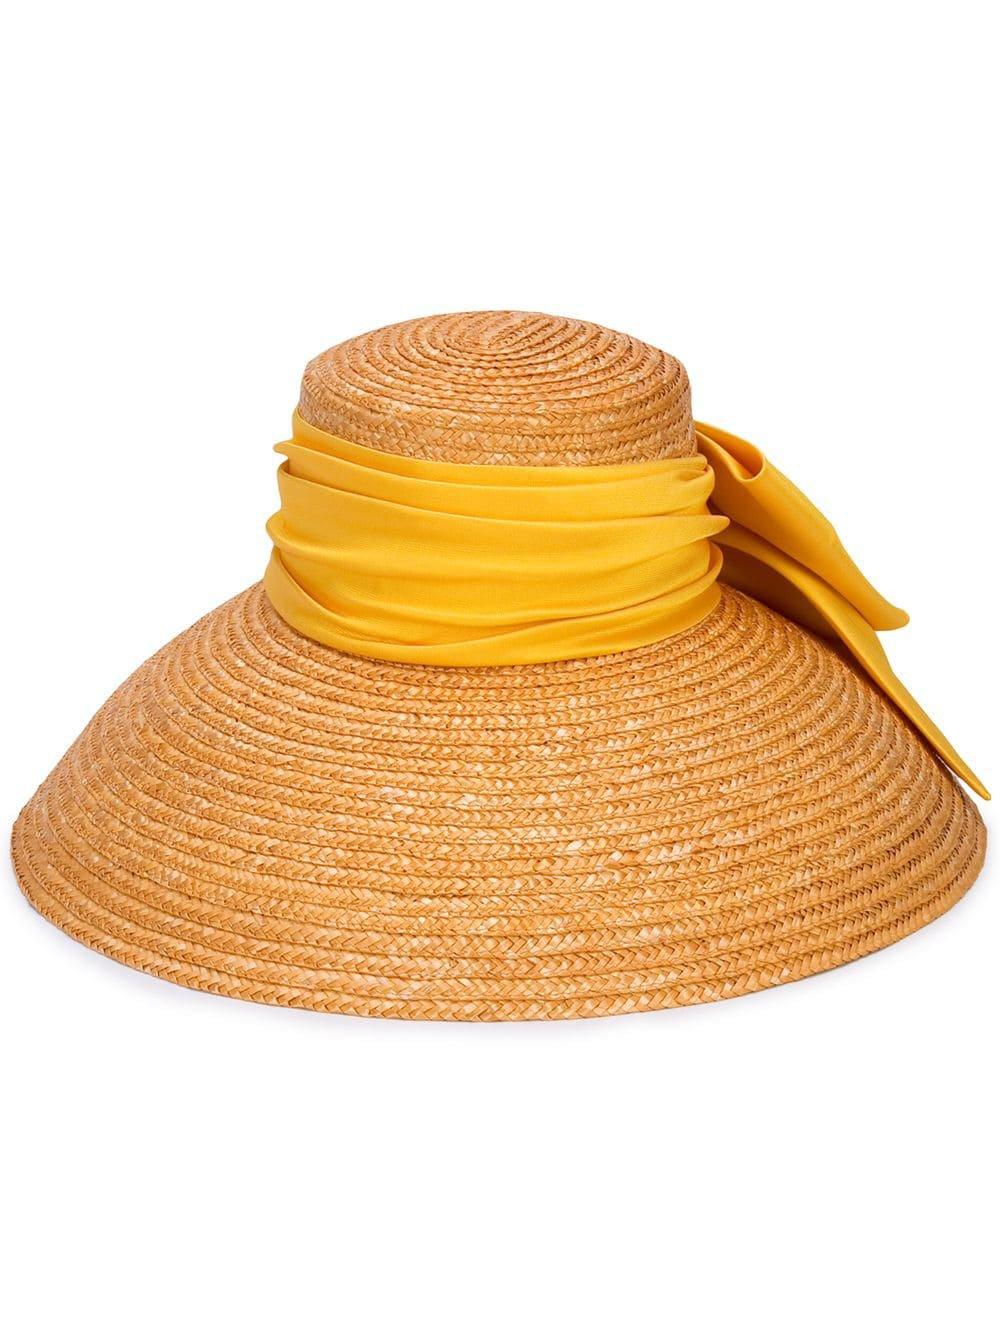 Eugenia Kim | large summer hat